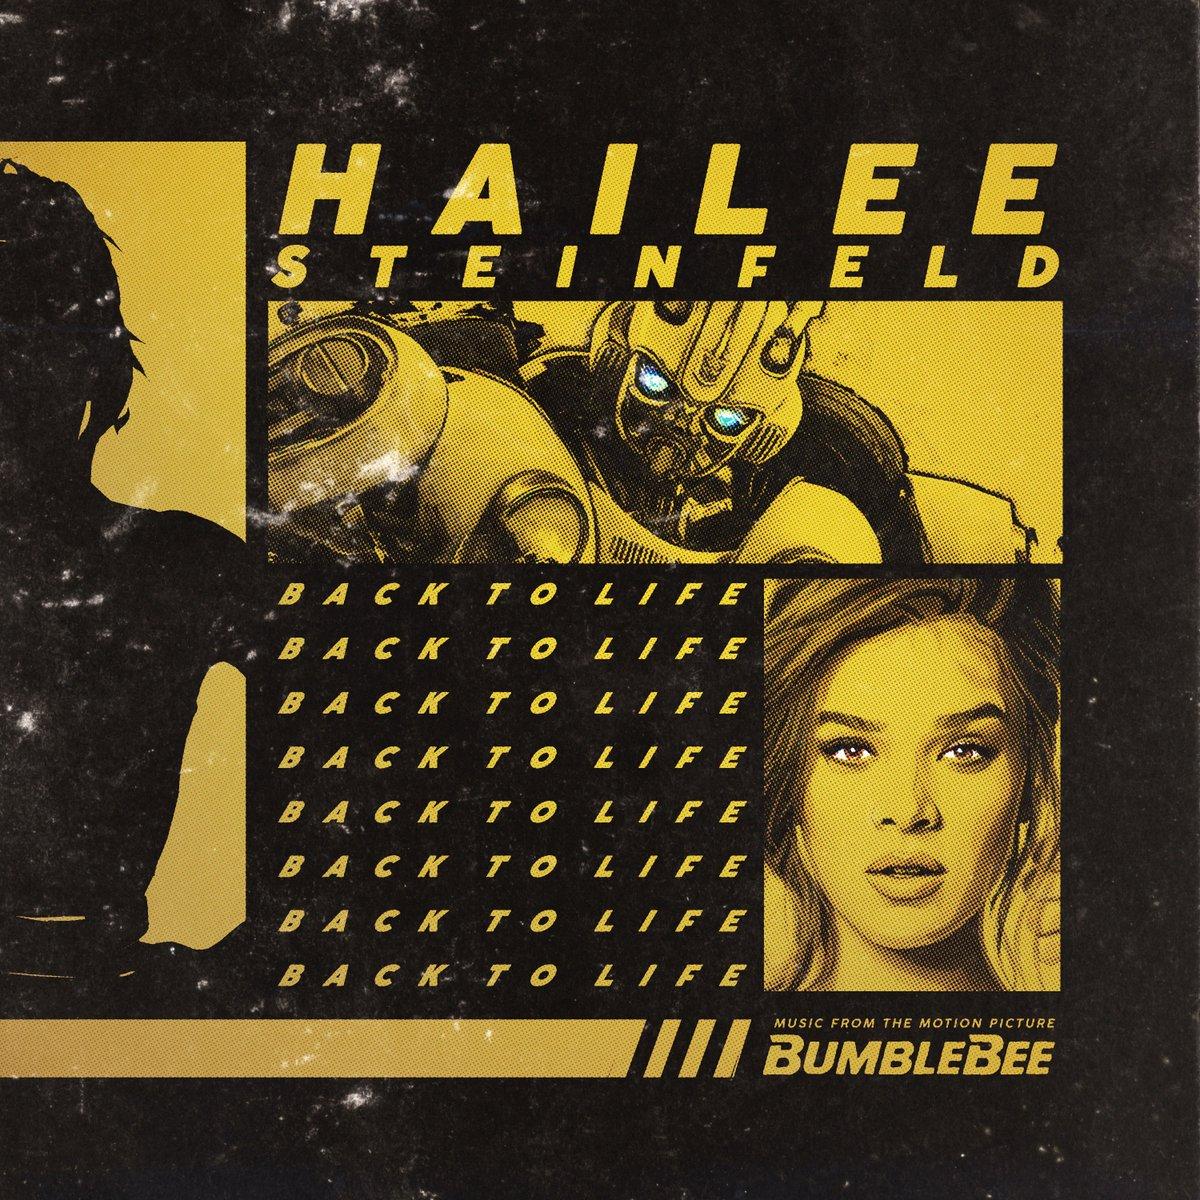 hailee-steinfeld-back-to-life